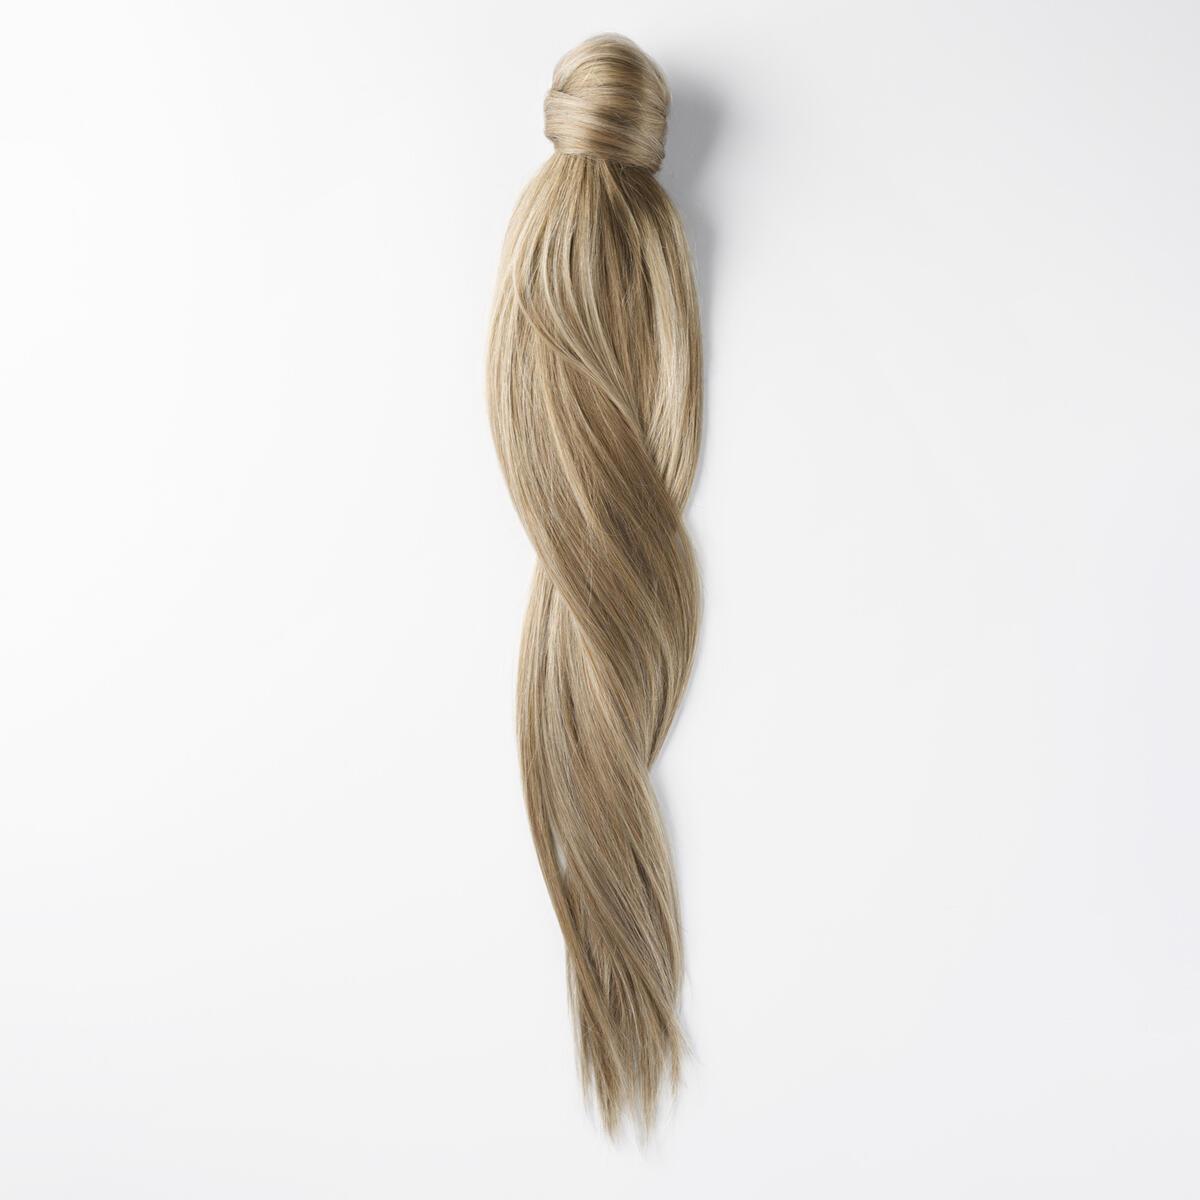 Clip-in Ponytail Original B2.6/10.7 Dark Ashy Blonde Balayage 50 cm